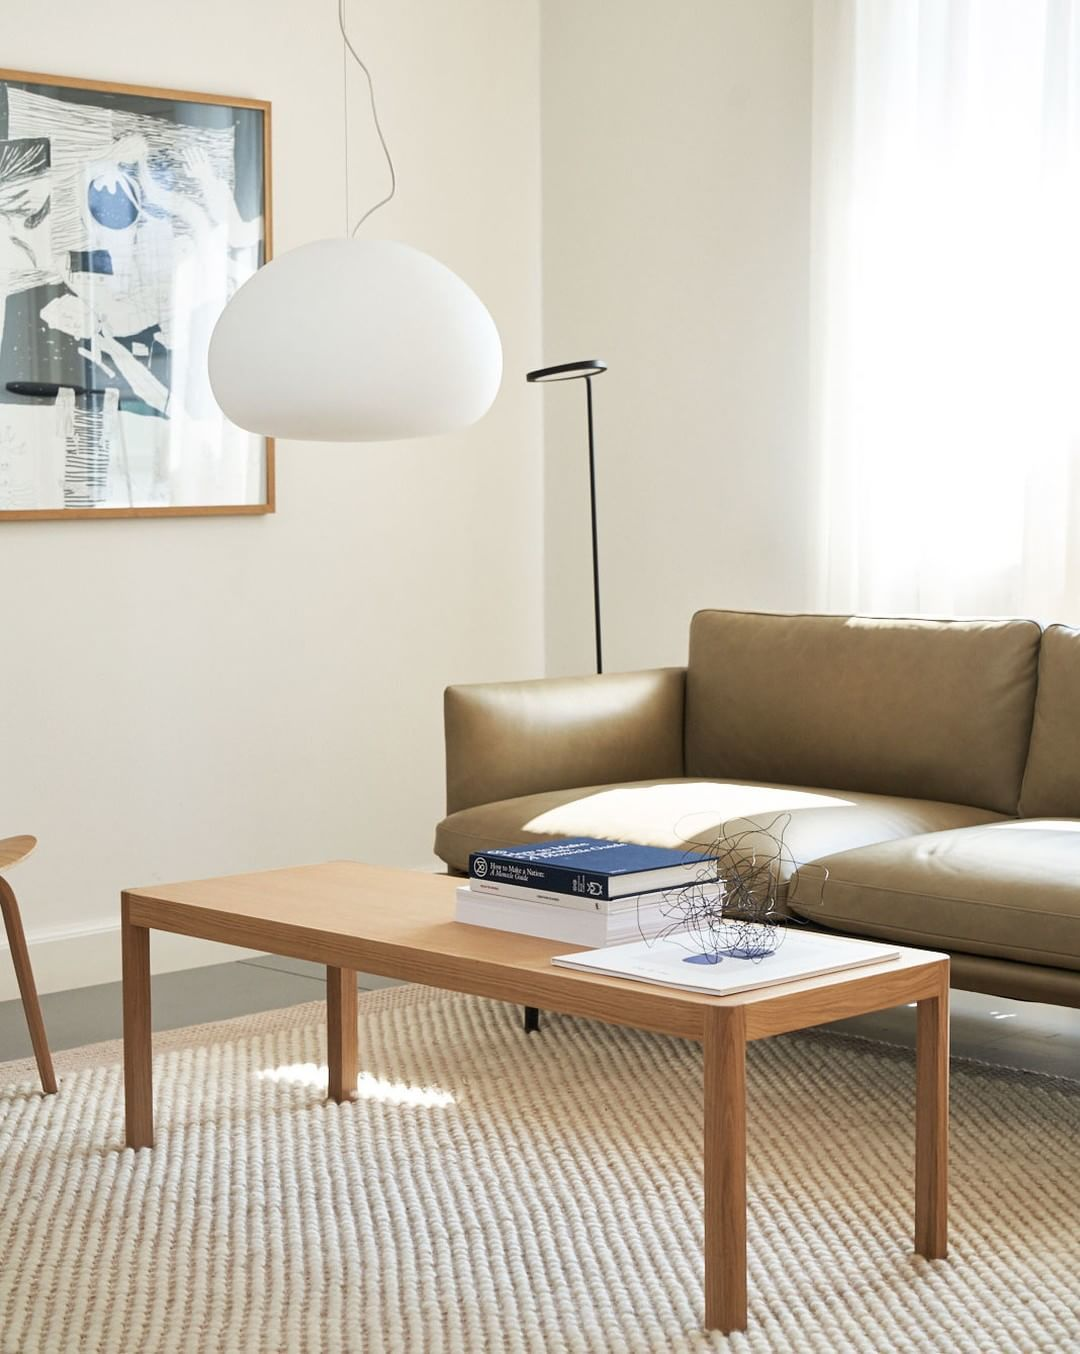 Muuto On Instagram Nestled Up In The Outline 3 Seater Sofa For The Aft Scandinavian Decor Living Room Living Room Decor Inspiration Scandinavian Sofa Design